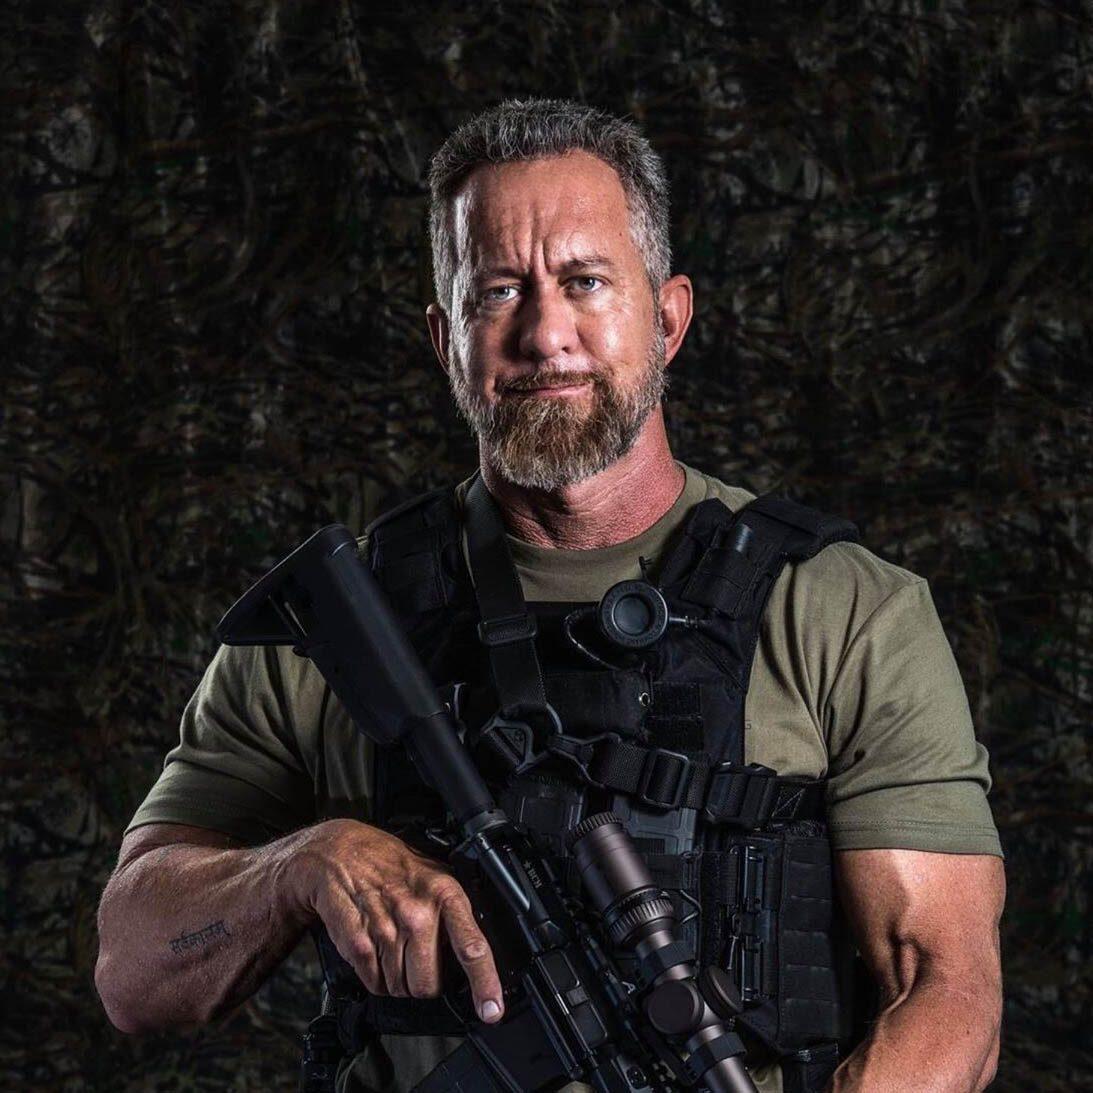 matt little firearm instructor